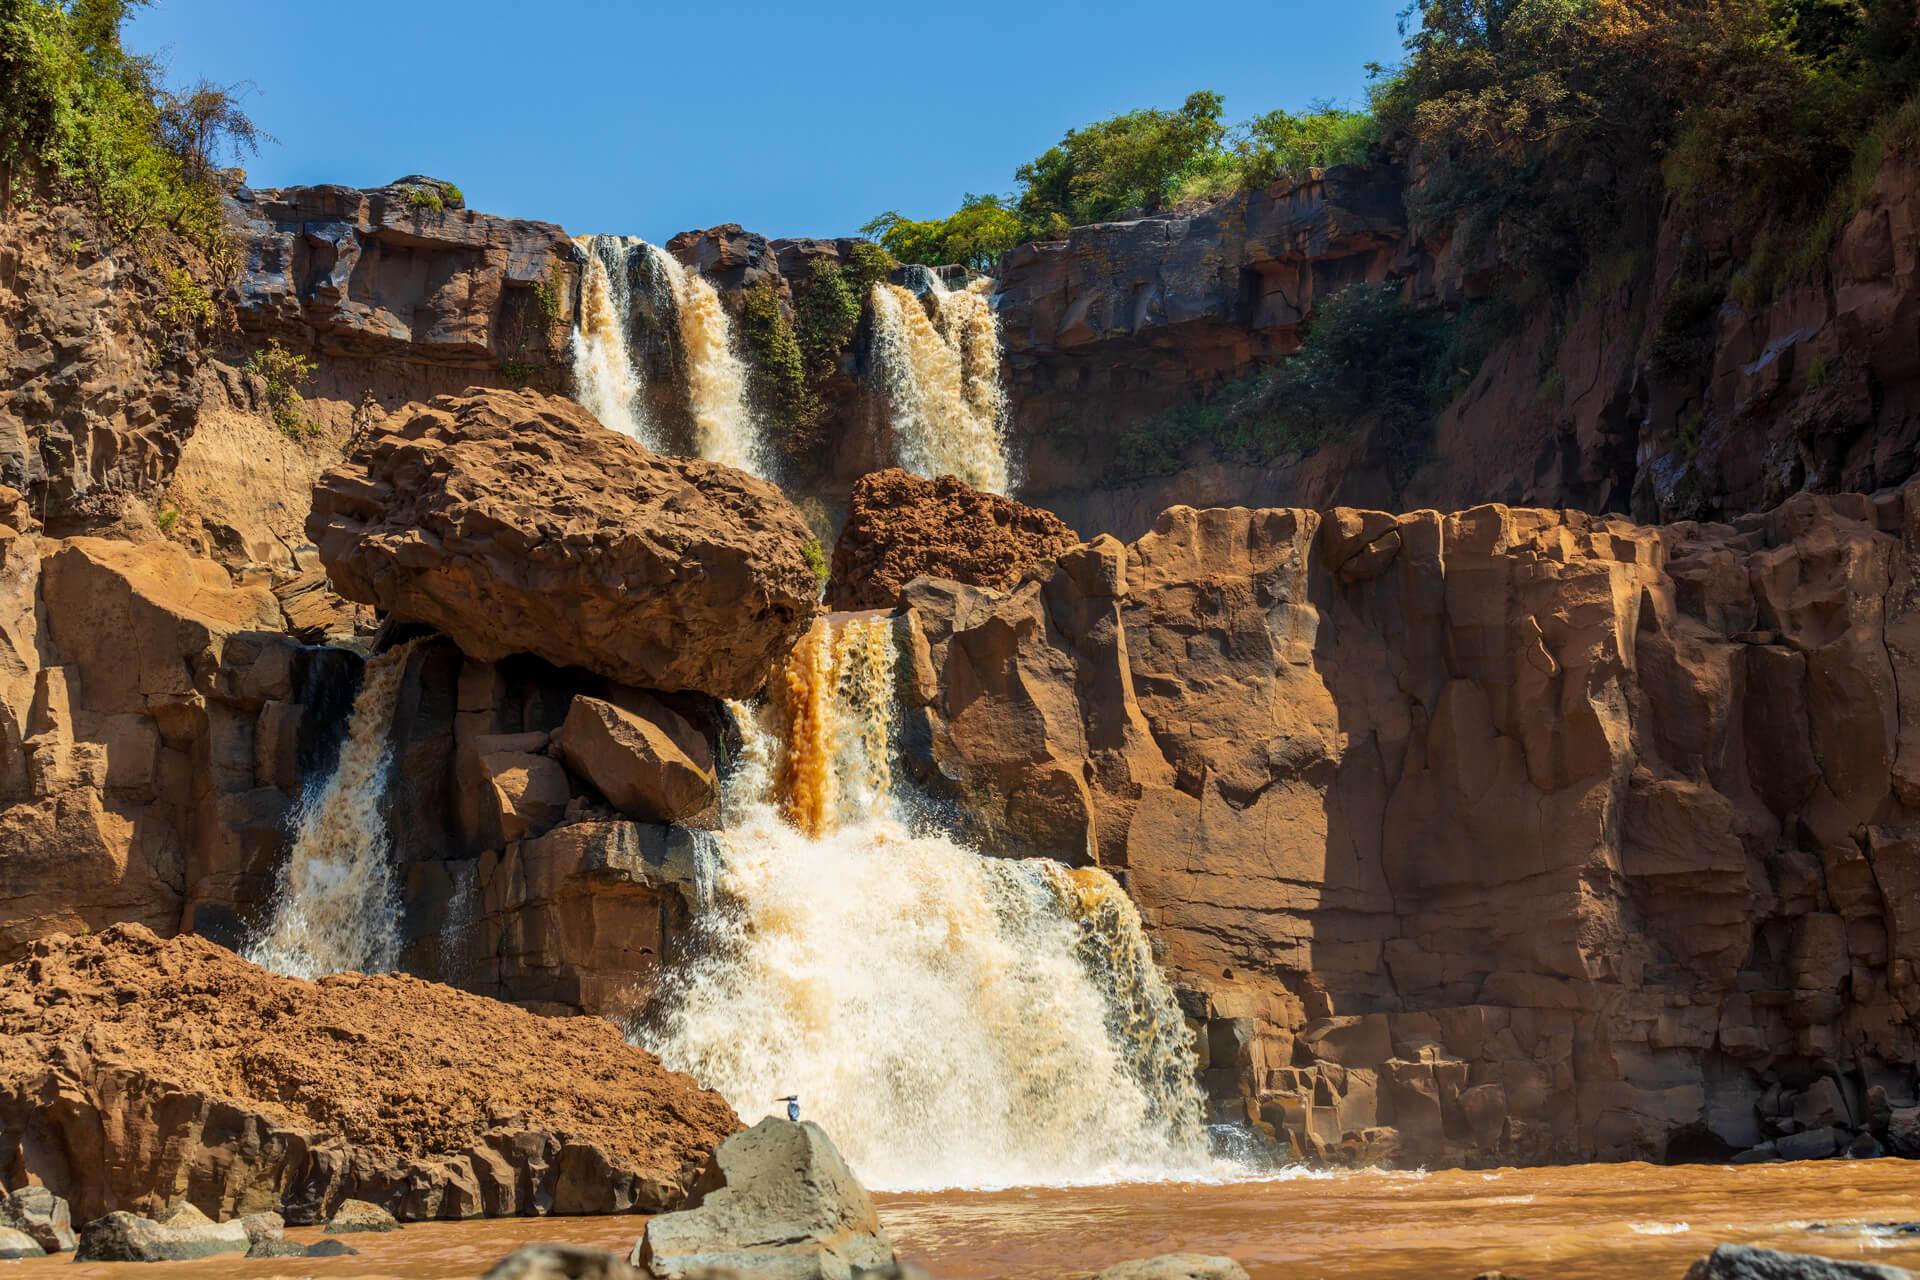 Ethiopia-Arba Minch-Abaja lake-waterfall-river-nature-landscape-nature-adventure